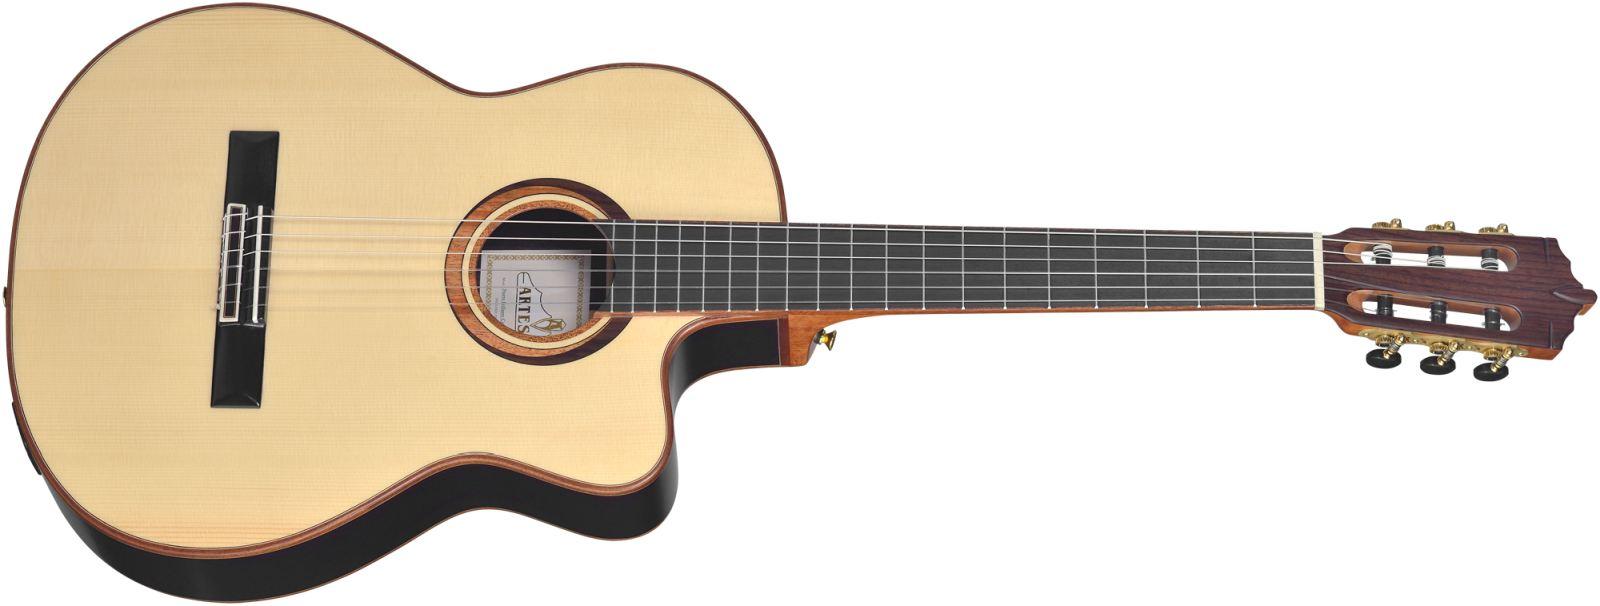 Artesano Nuevo Brillante Cut Konzertgitarre